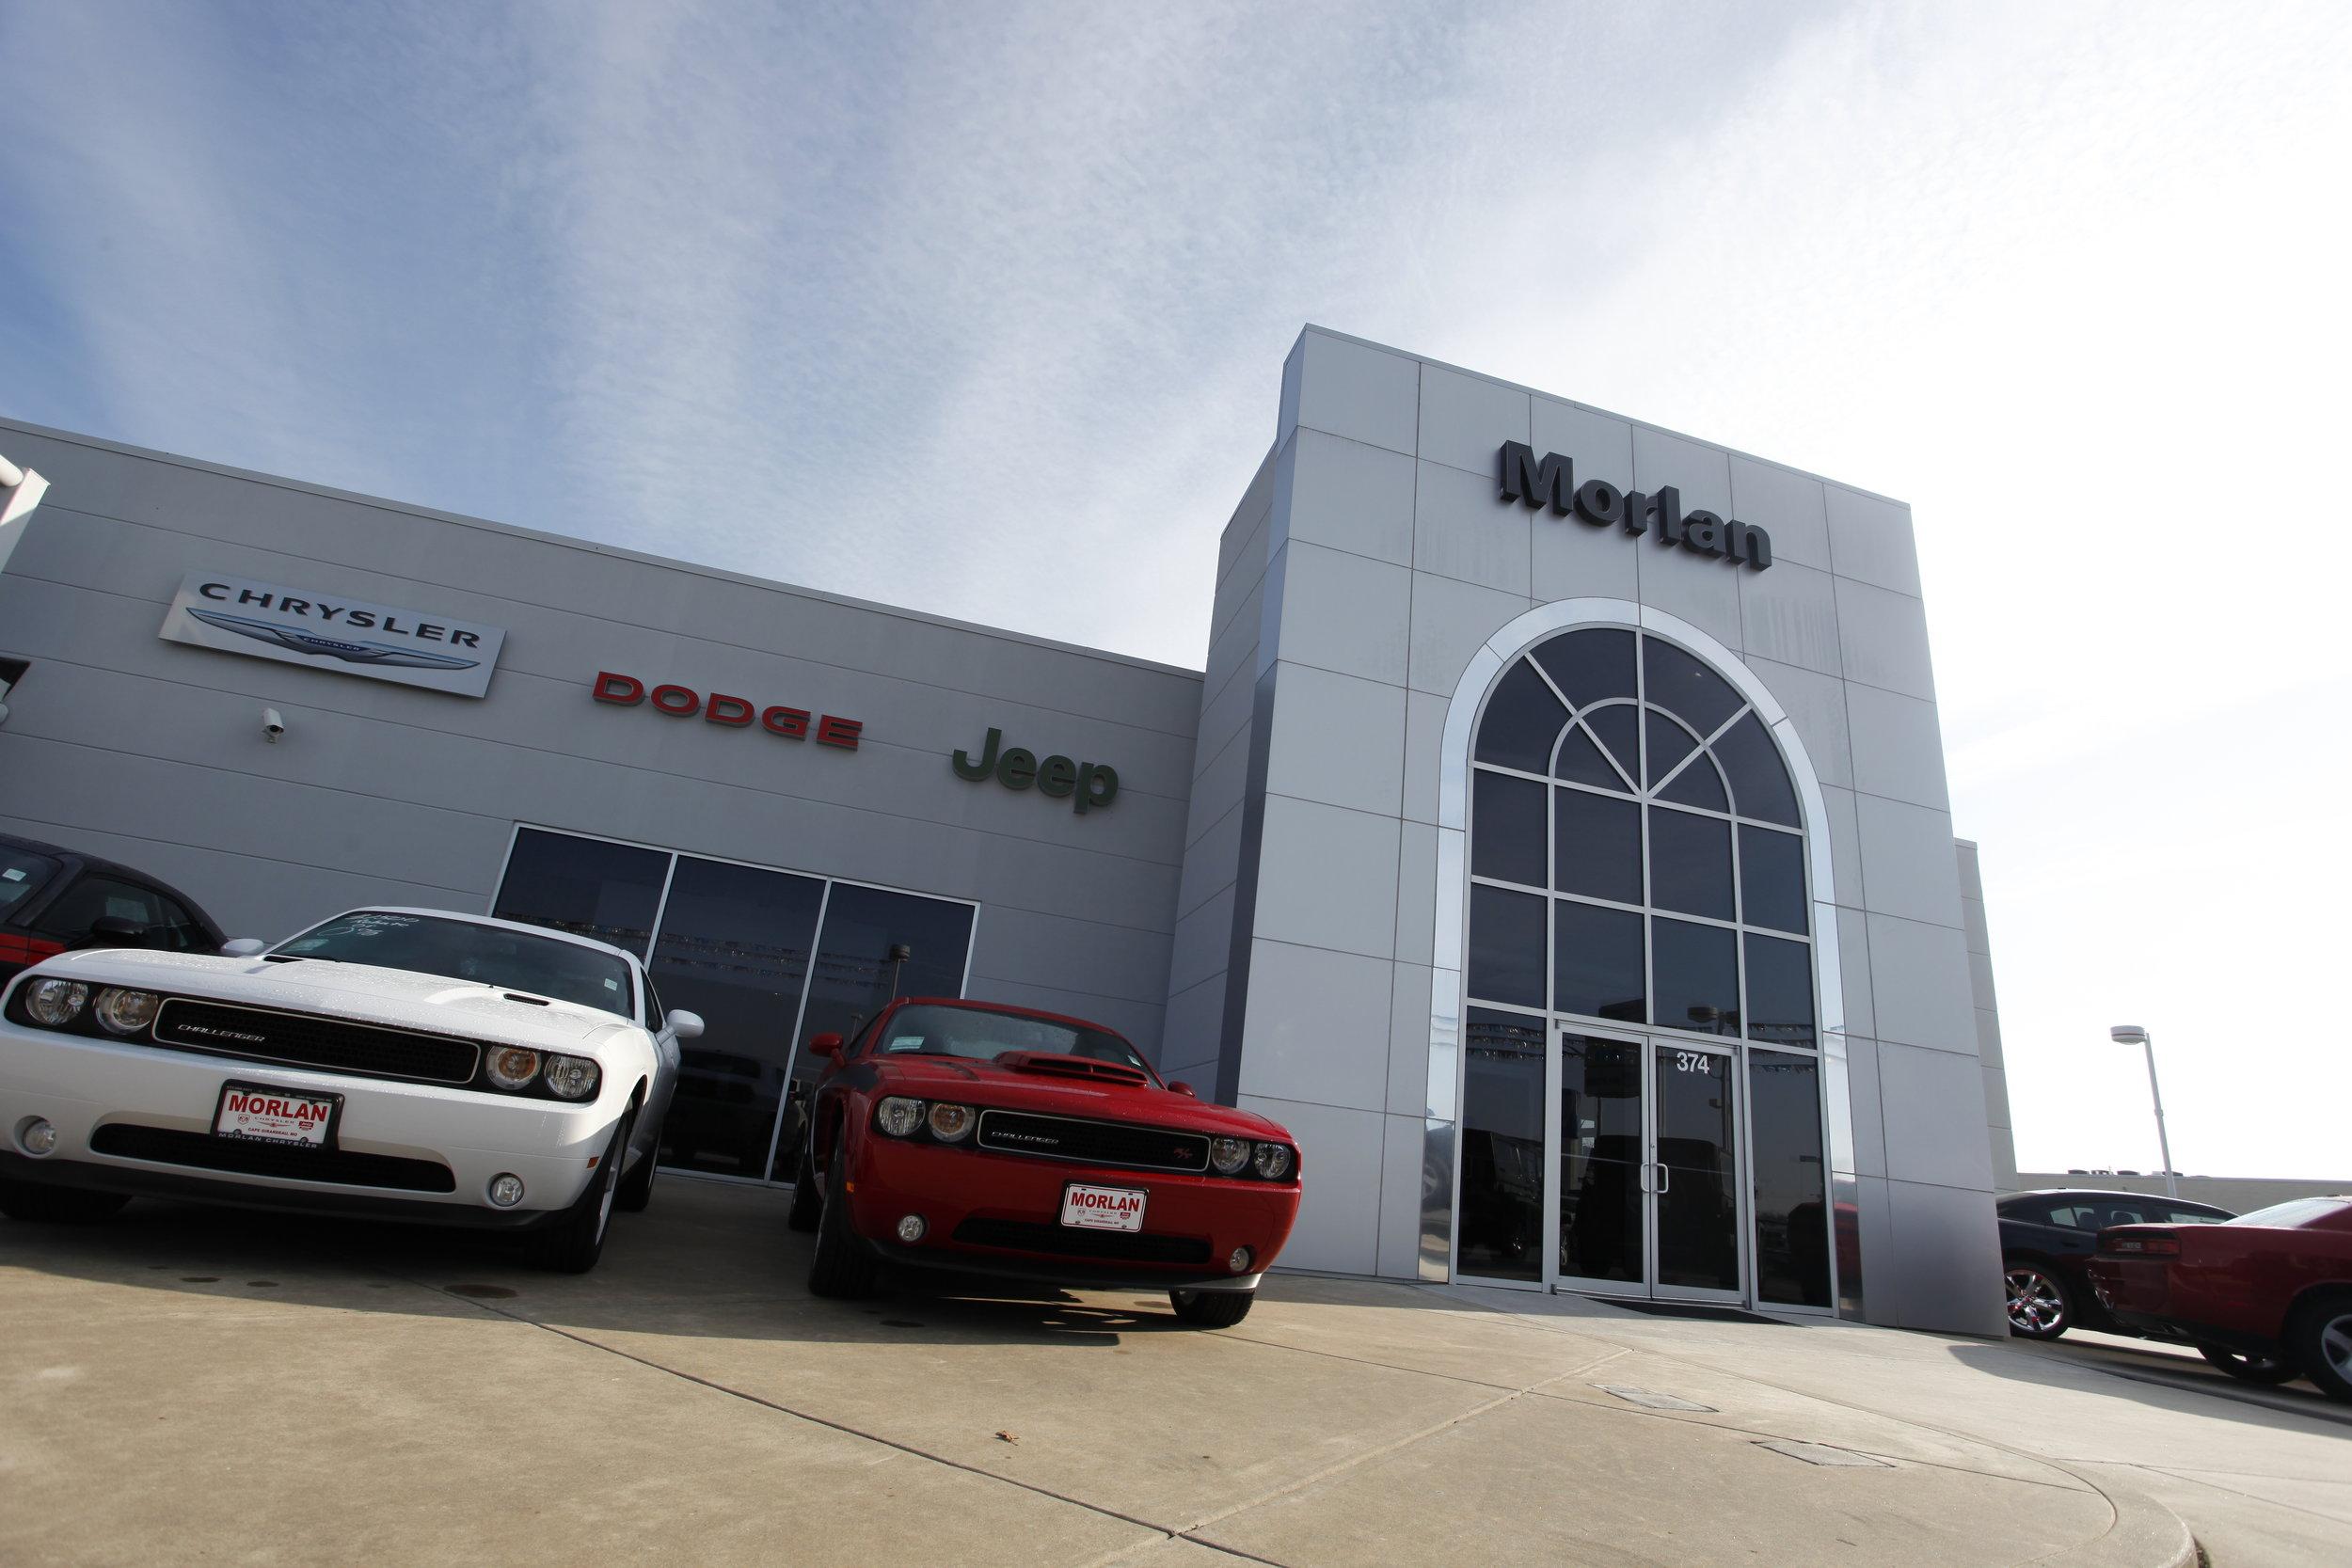 Morlan Chrysler Dodge Jeep - Cape Girardeau, Missouri